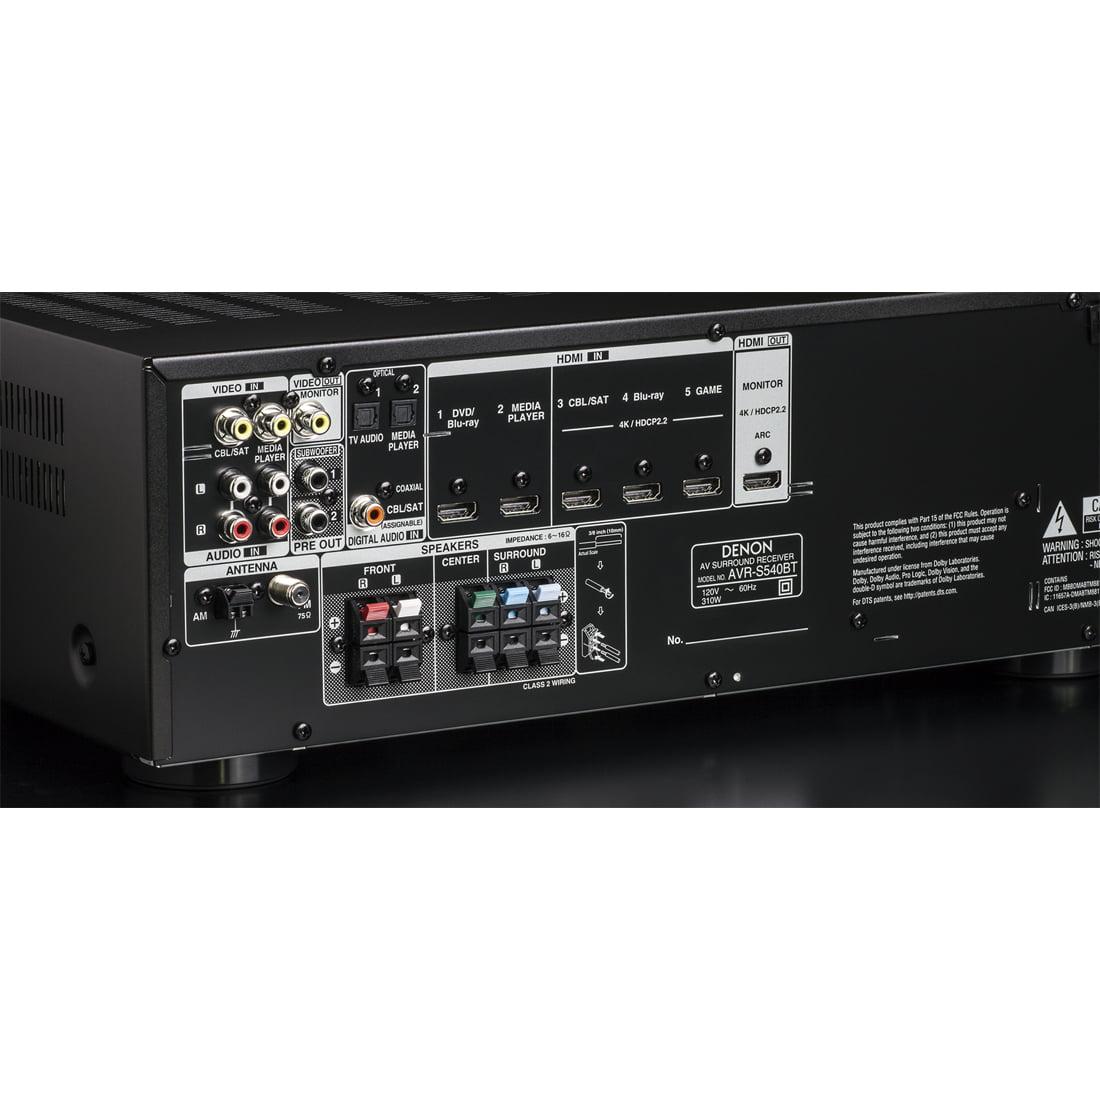 Denon AVR-S540BT 5 2 Channel 4K Ultra HD AV Receiver